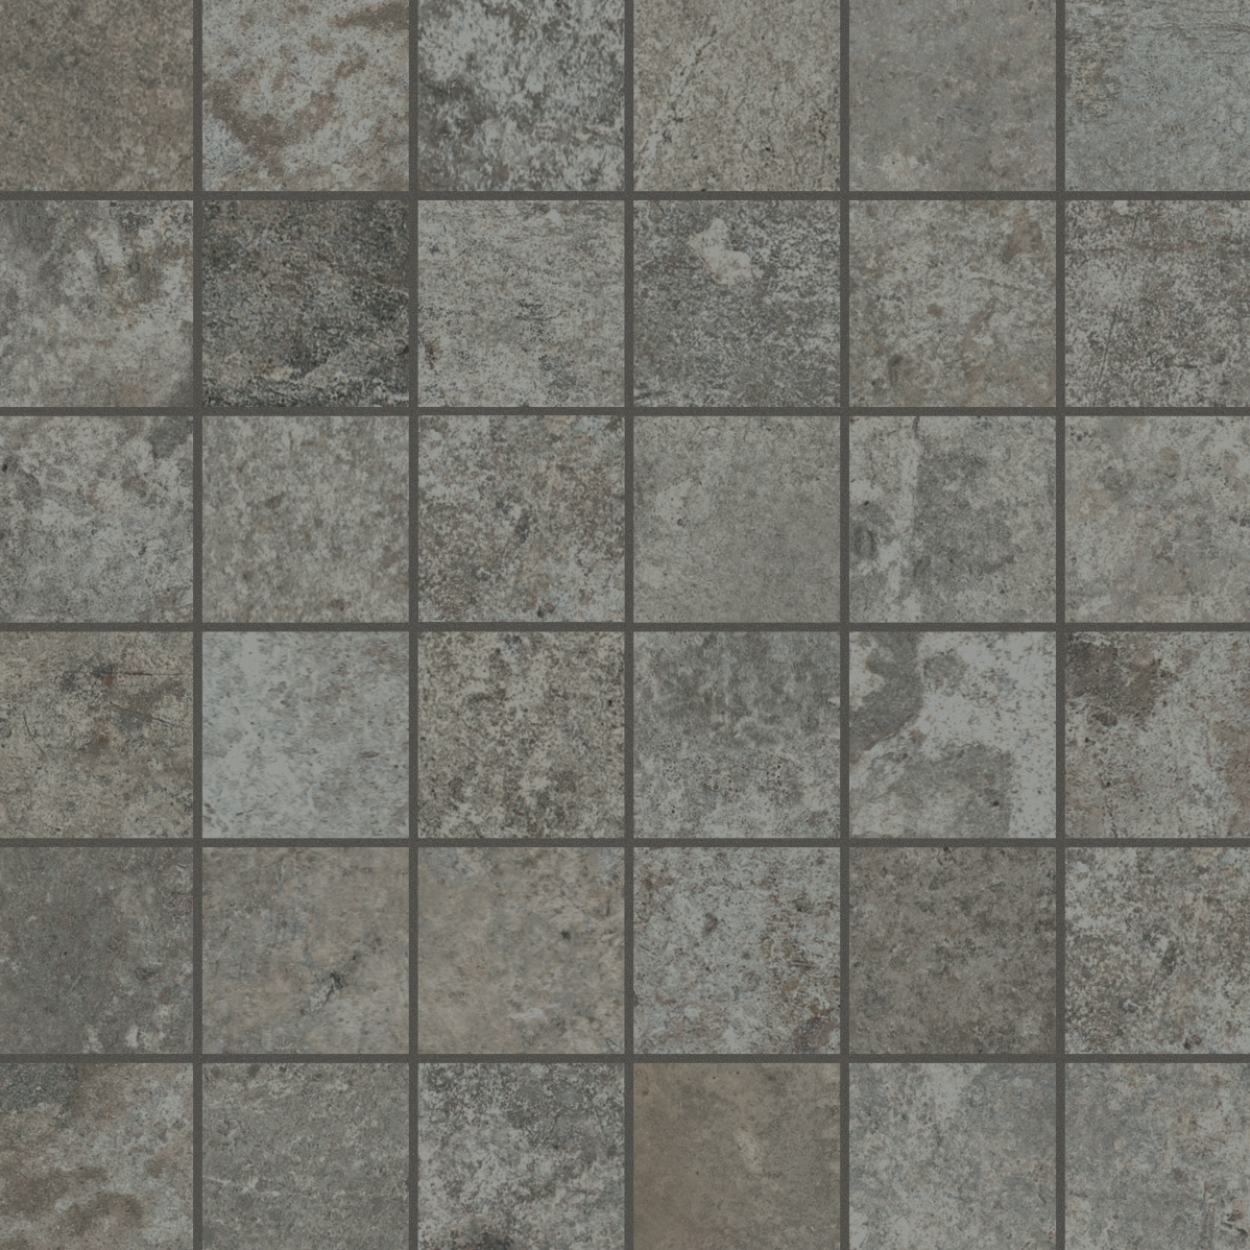 Unicom Starker DEBRIS SOOT MOSAICO UNI-0008039 Mosaik 30x30 Matt